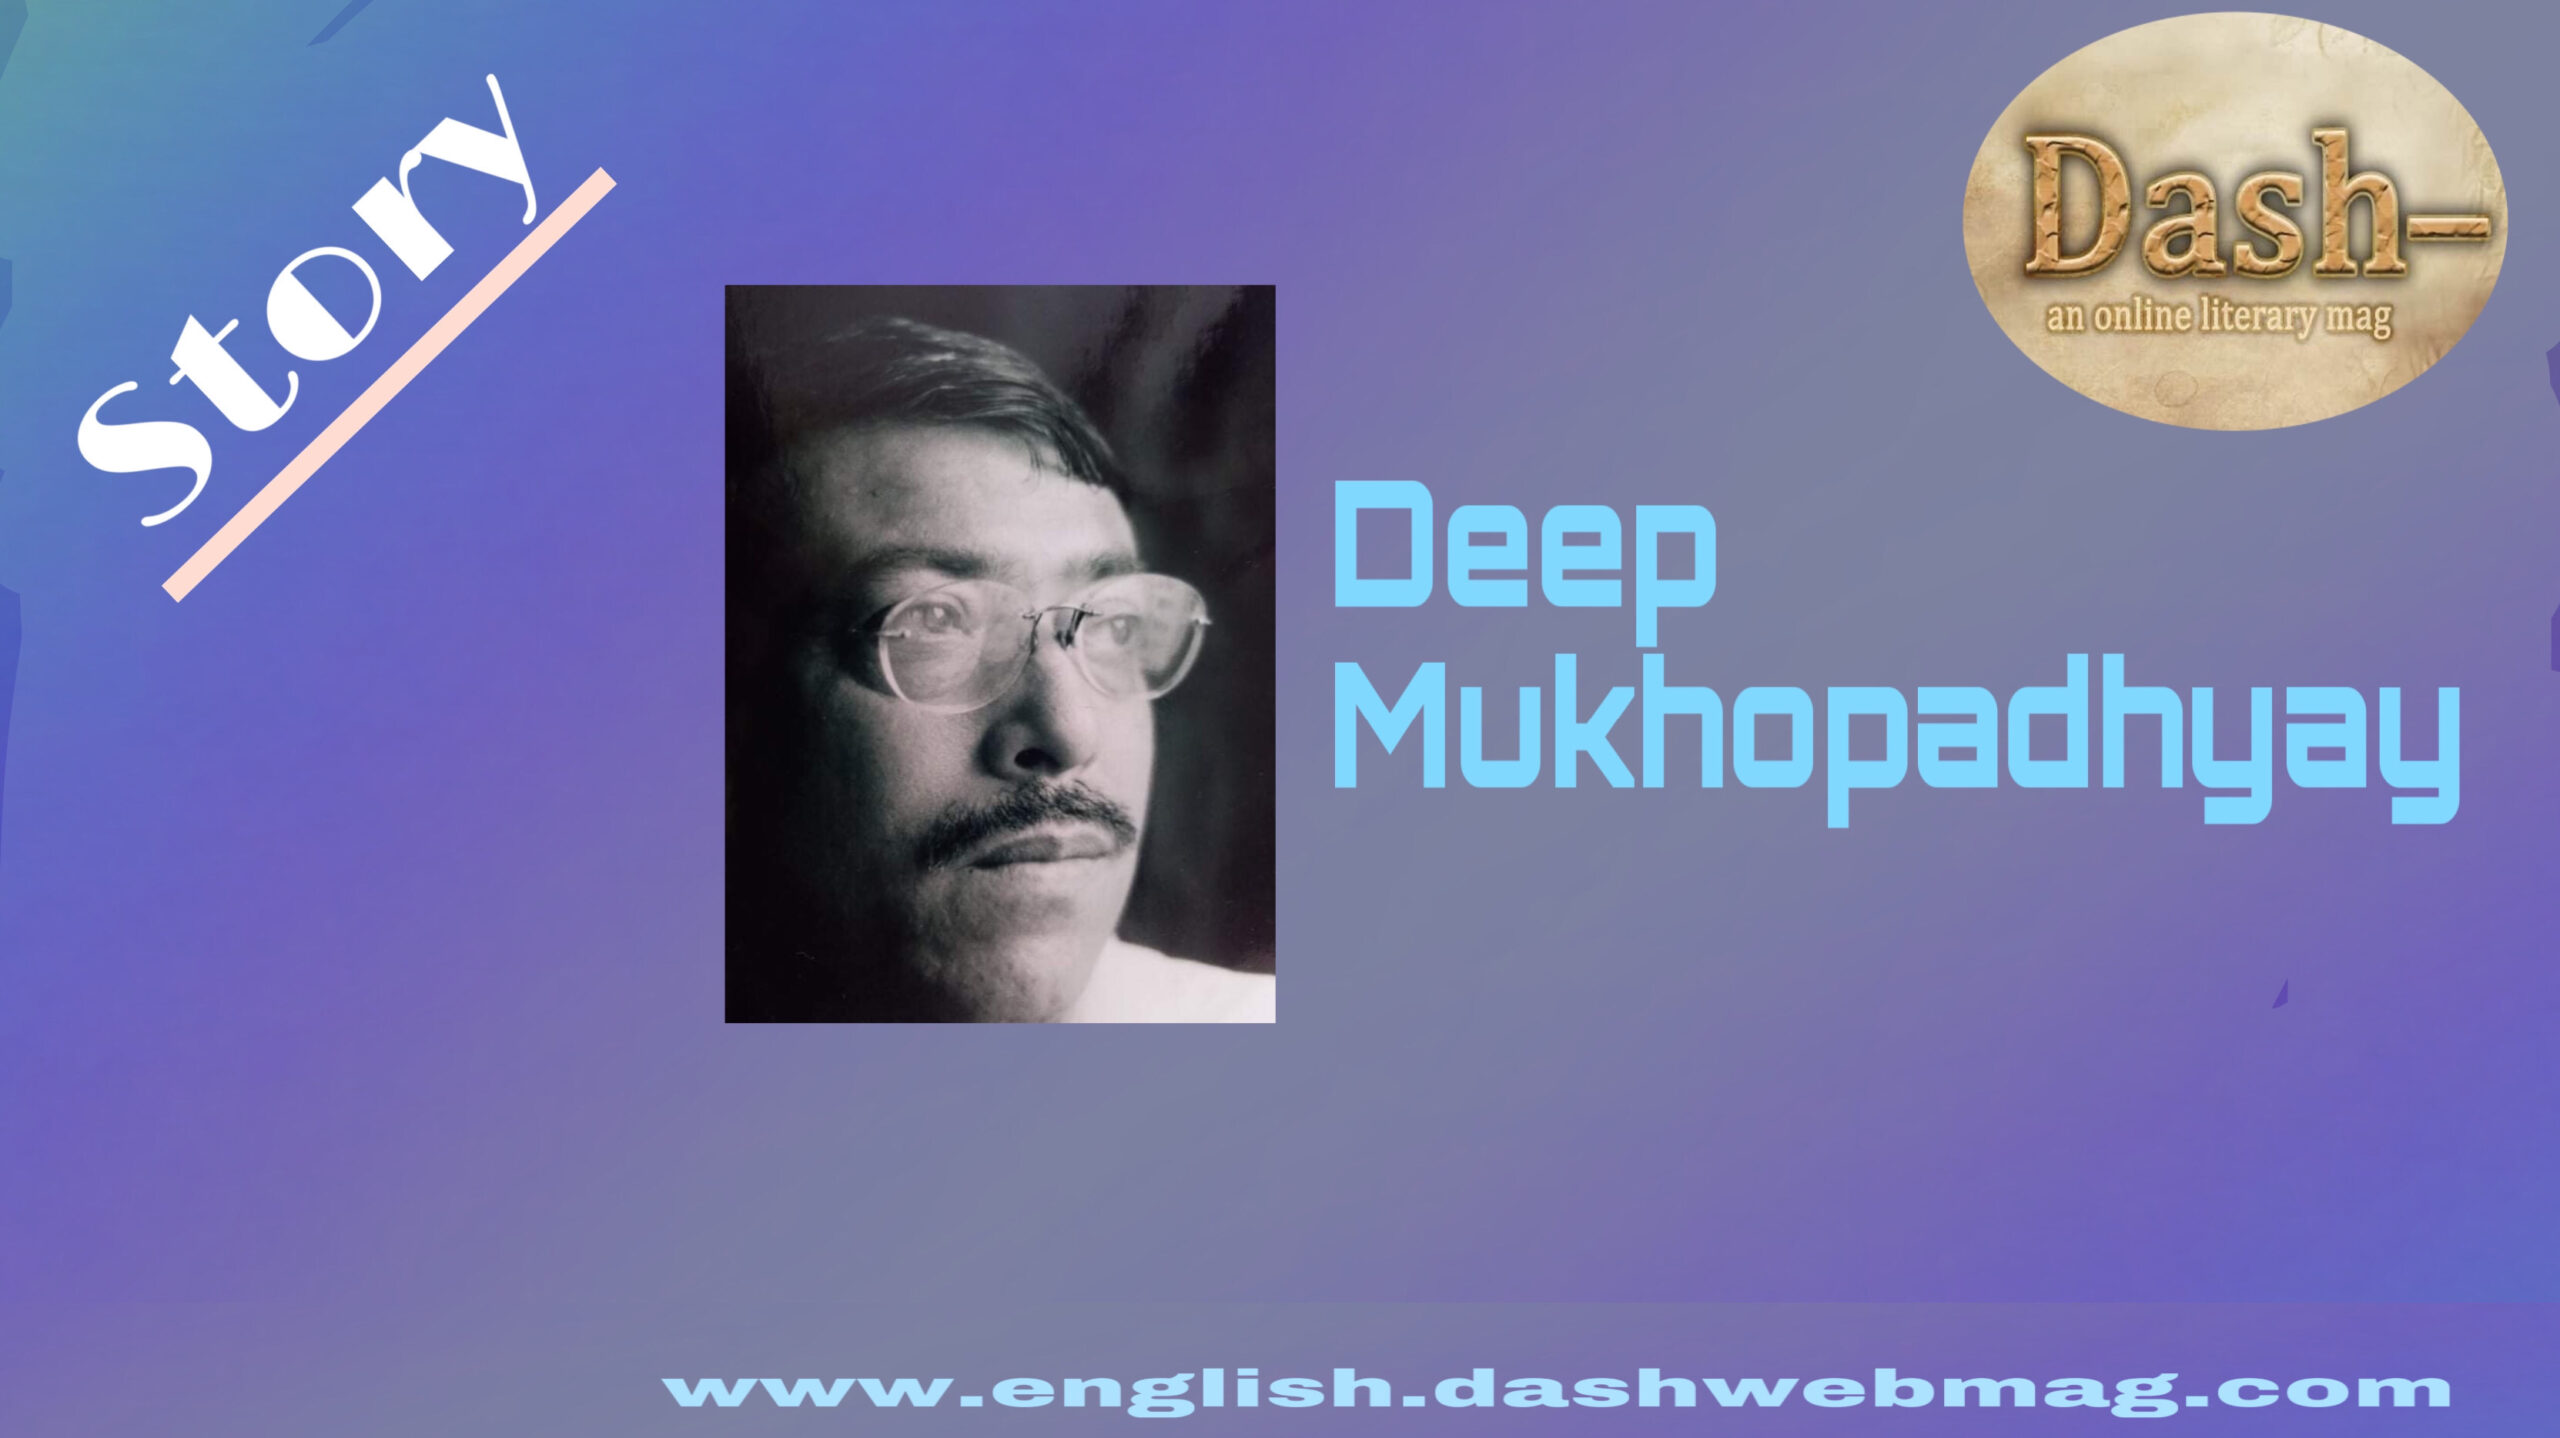 Story by Deep Mukhopadhyay